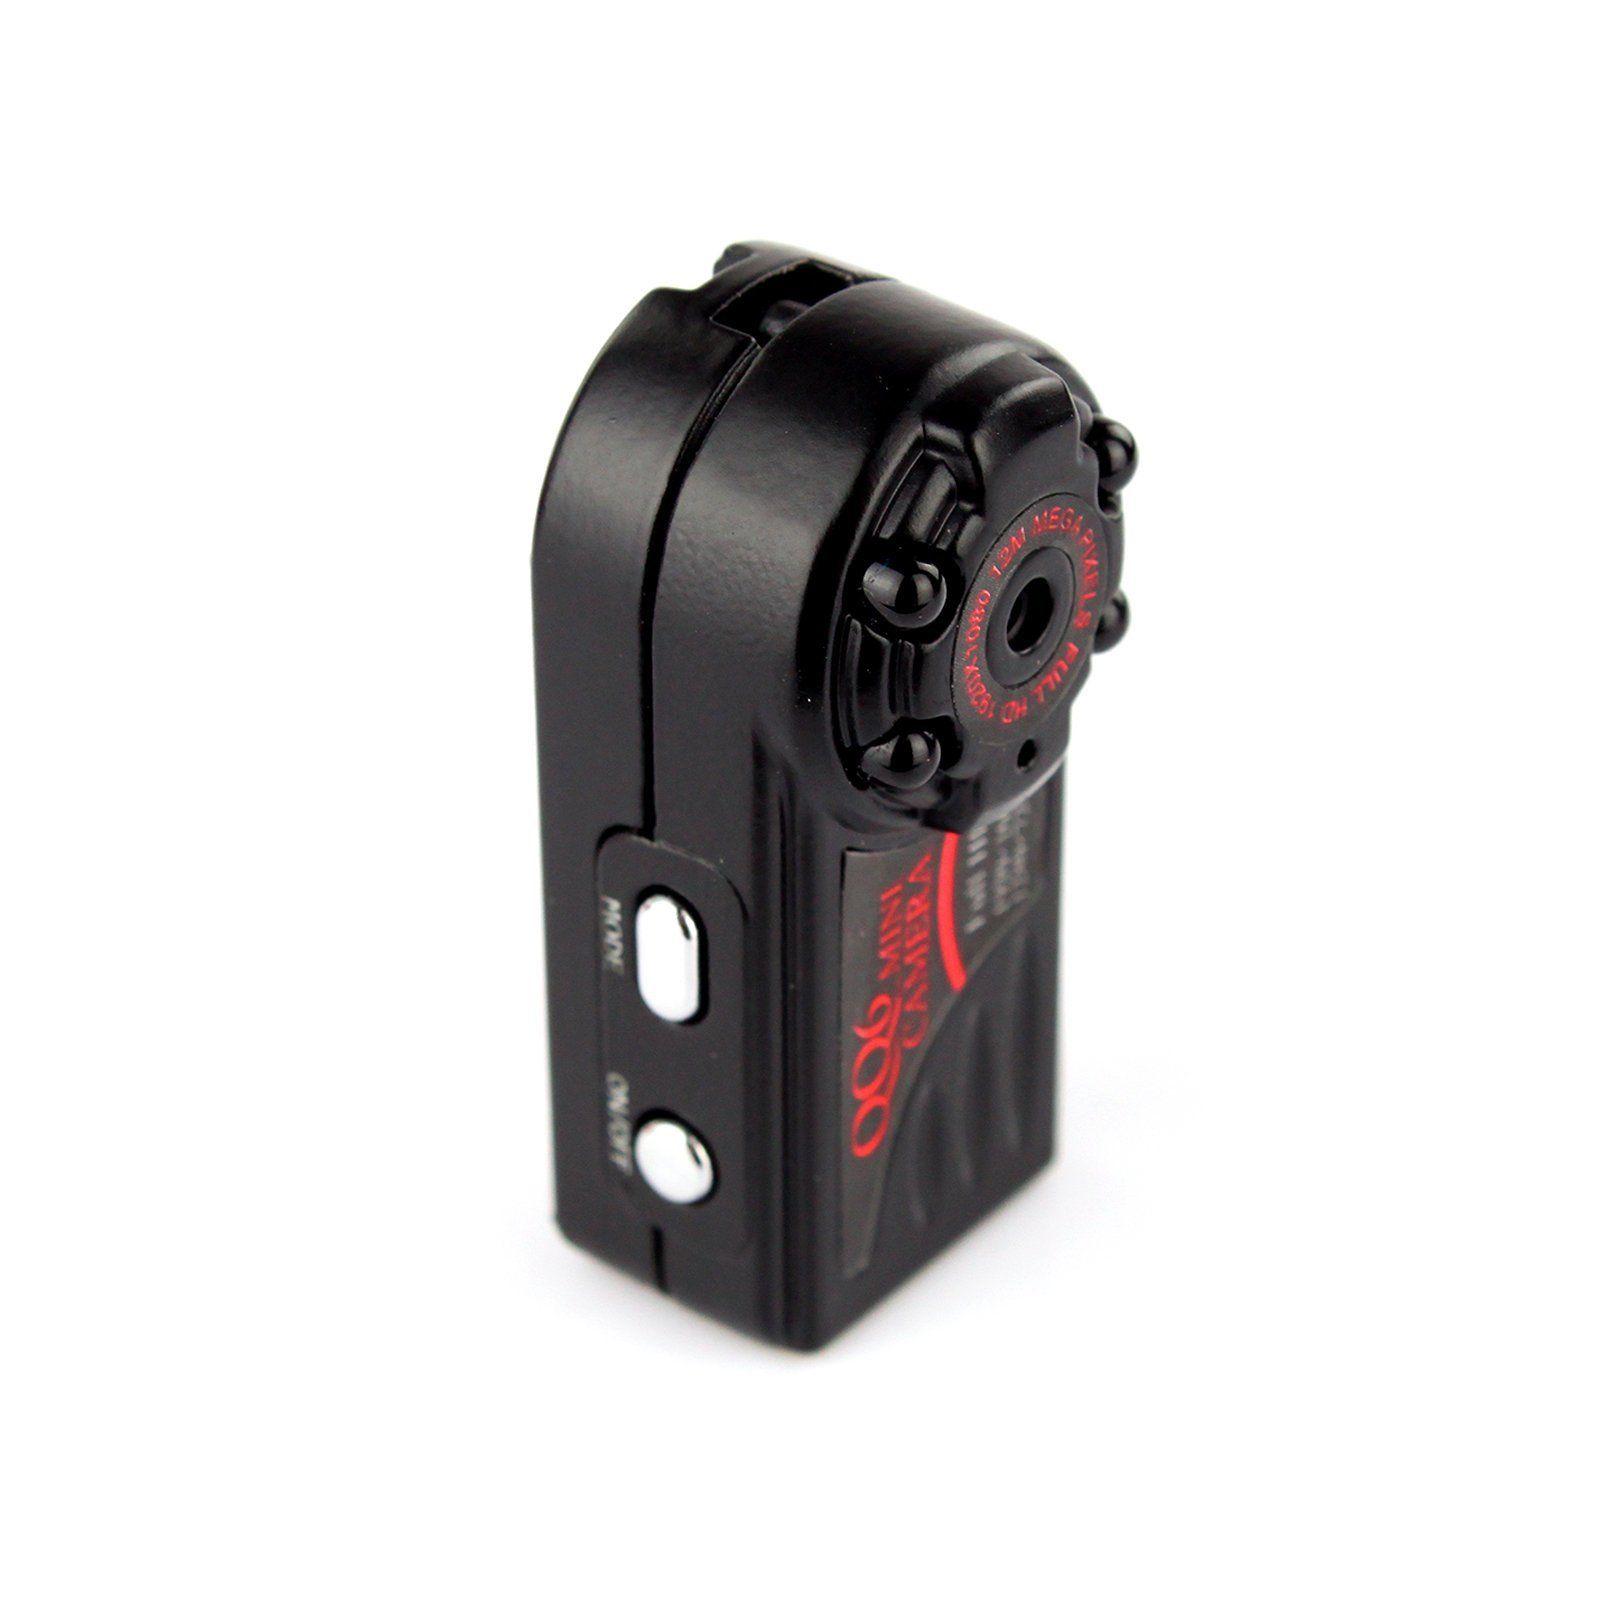 16GB Card+QQ6 Mini DV Full HD 1080P Digital Car Video Recorder Thumb Metal Mini Camera lc 08 mini dv headphone 1080p hd sport dv bluetooth headset stereo neck strap video recorder